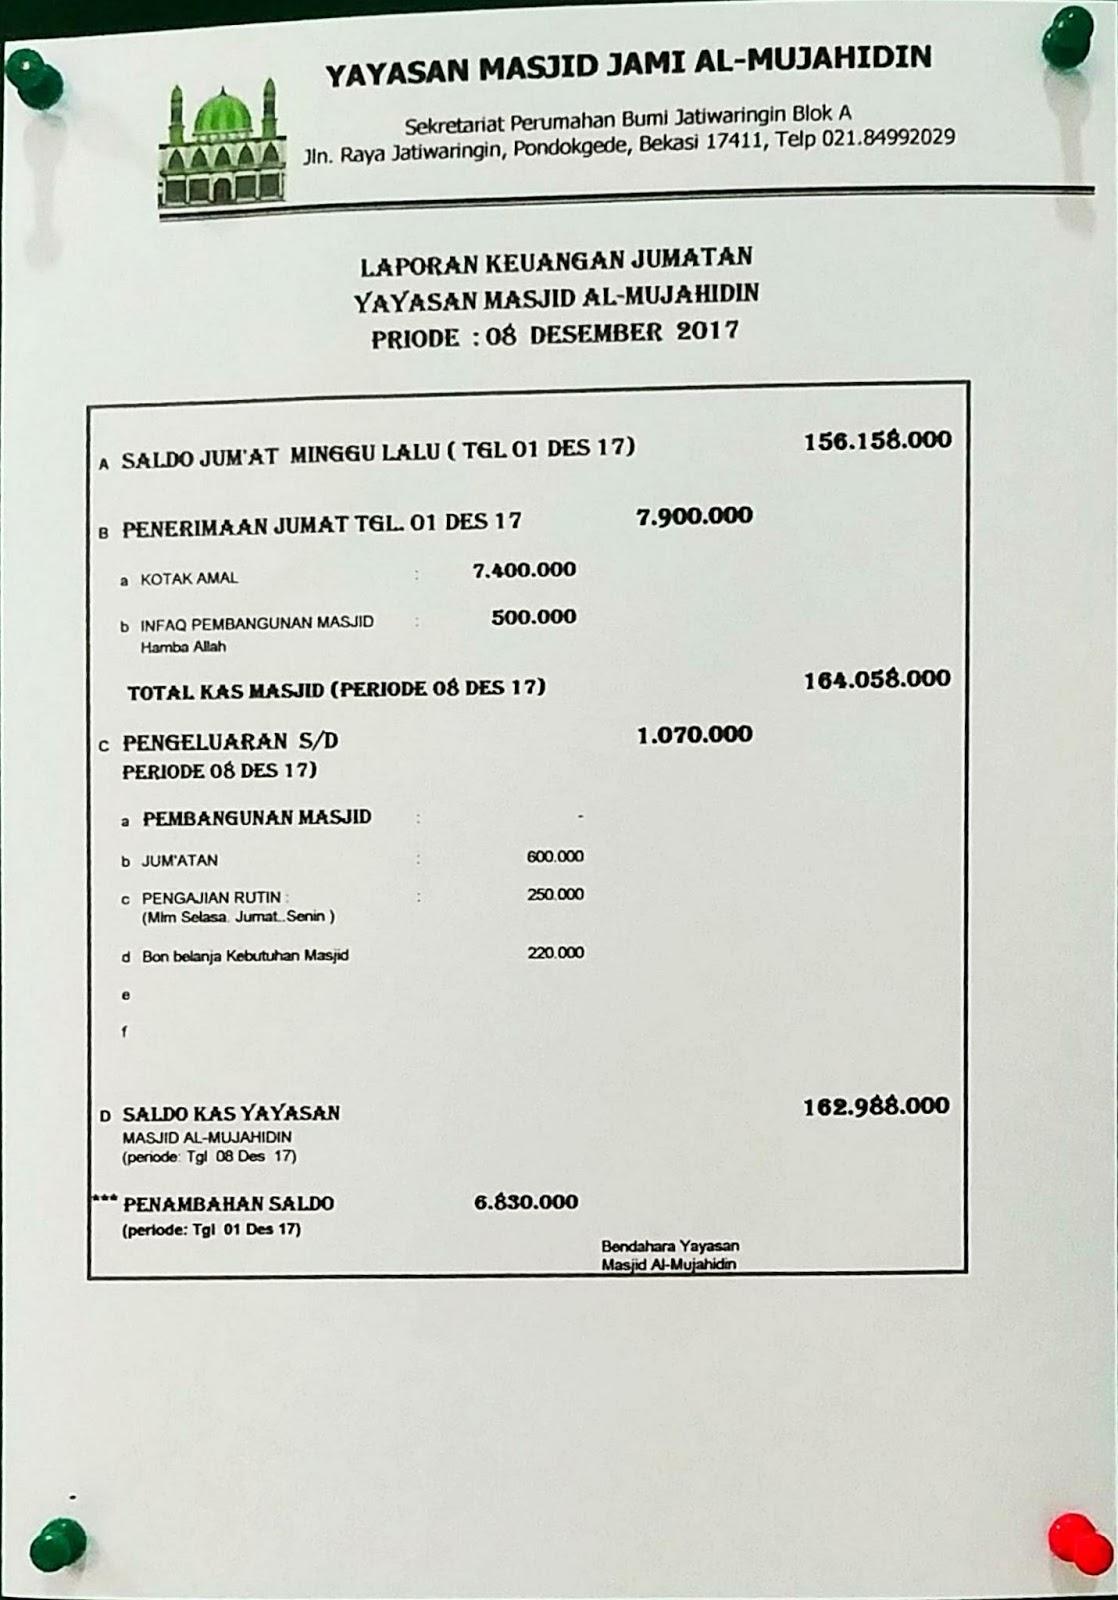 Yayasan Masjid Al Mujahidin Jatiwaringin Laporan Keuangan 8 Desember 2017